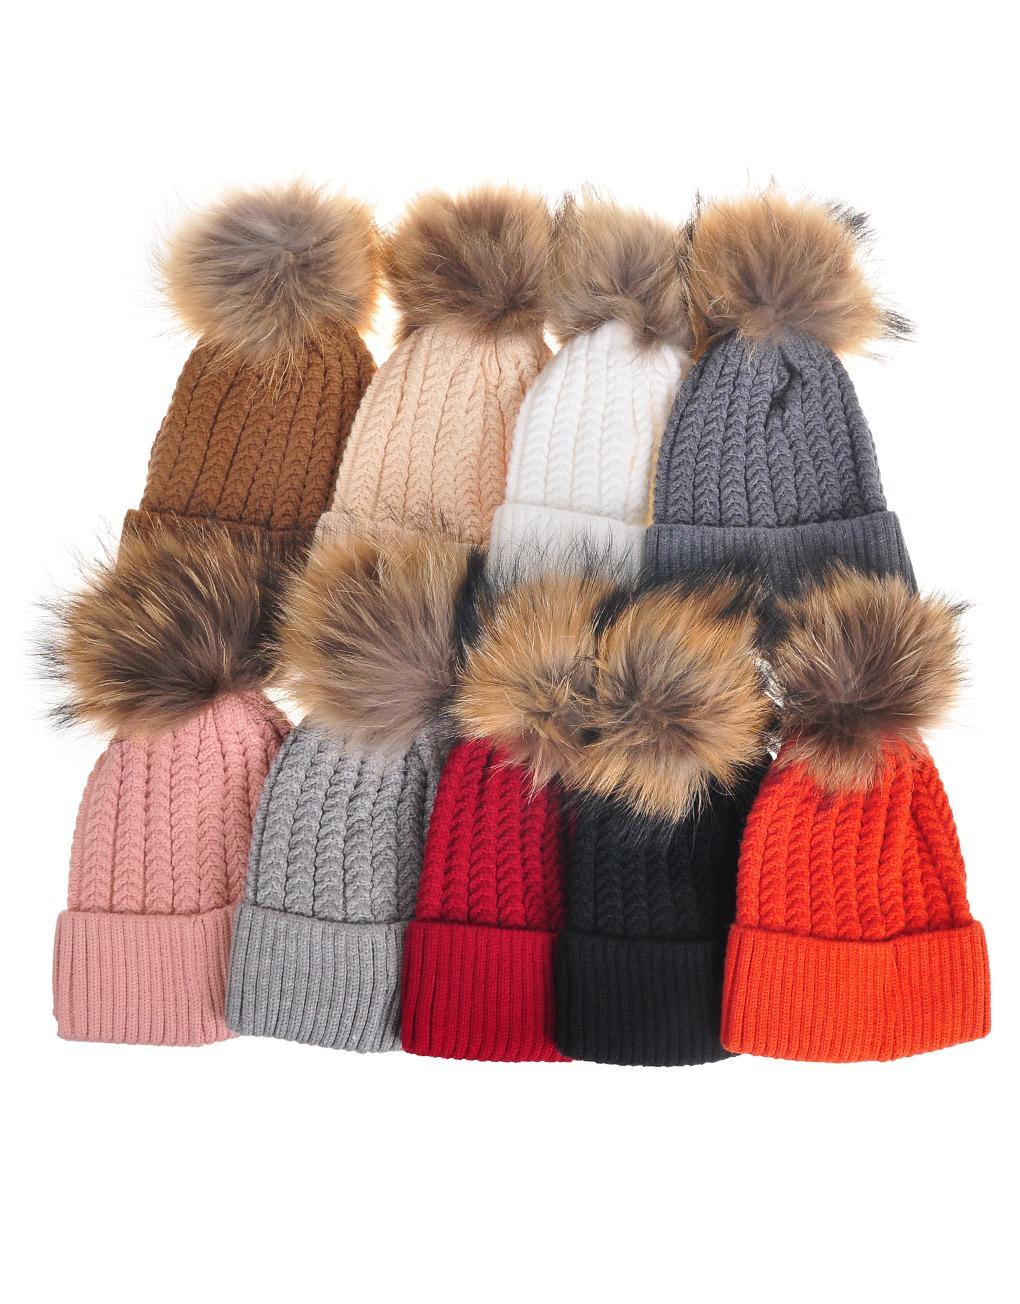 b369e52e0c7a6 Slim Pom pom beanie Hats - Luxe Wholesale